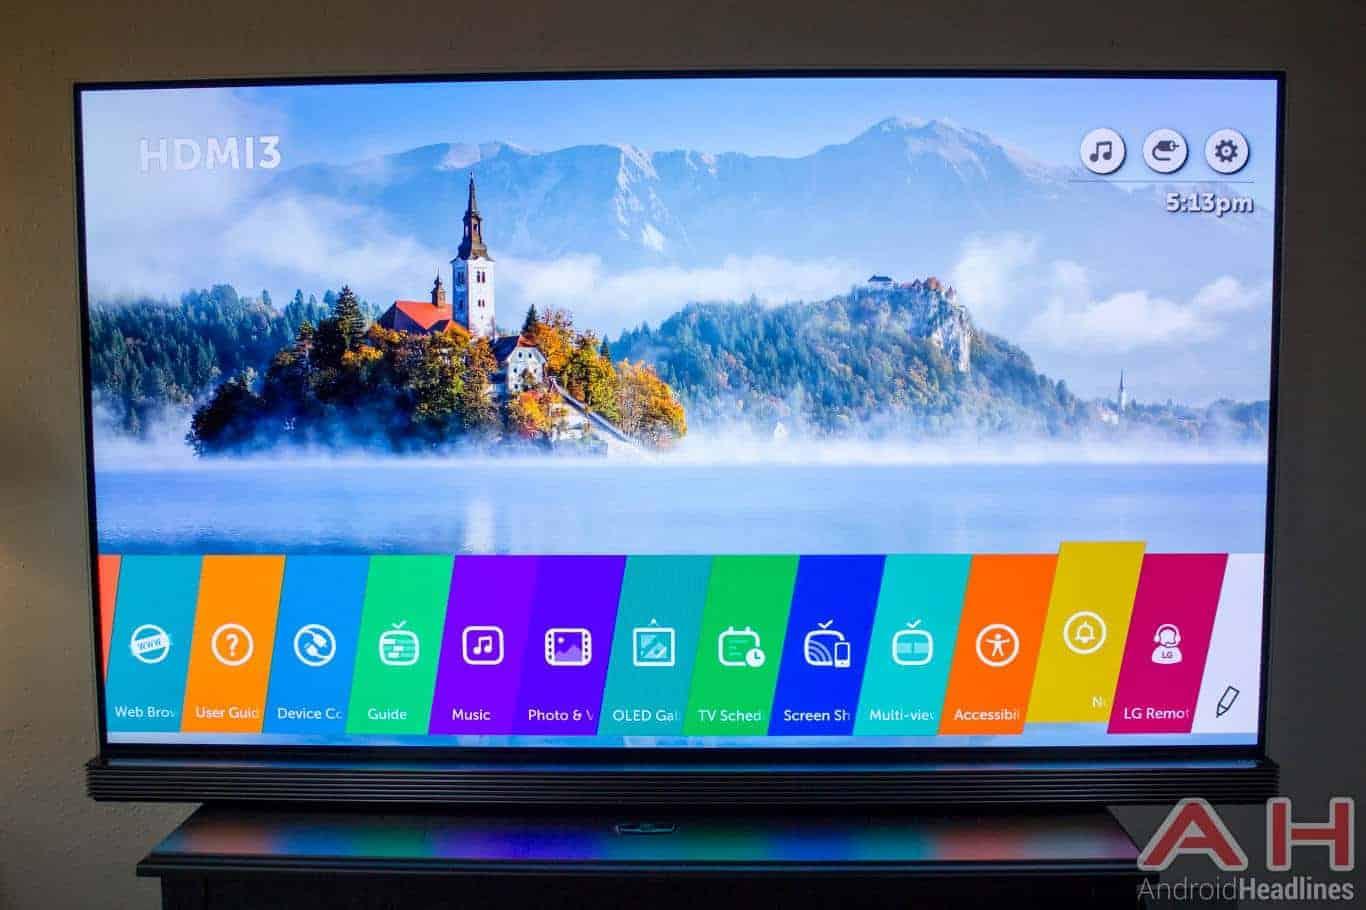 LG OLED 65G7P AH NS webos 3